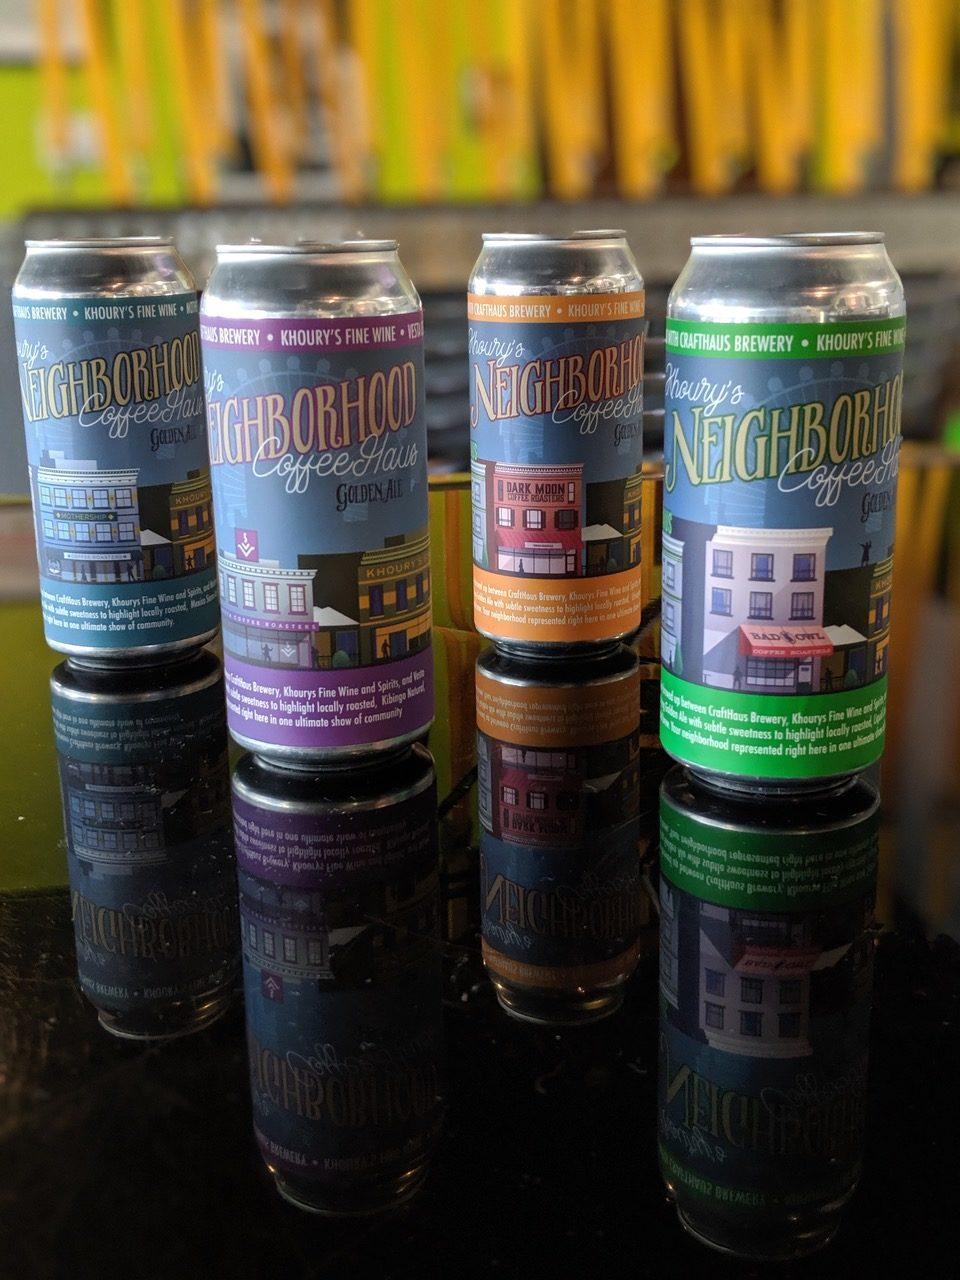 Crafthaus_Brewery_coffee_beer3